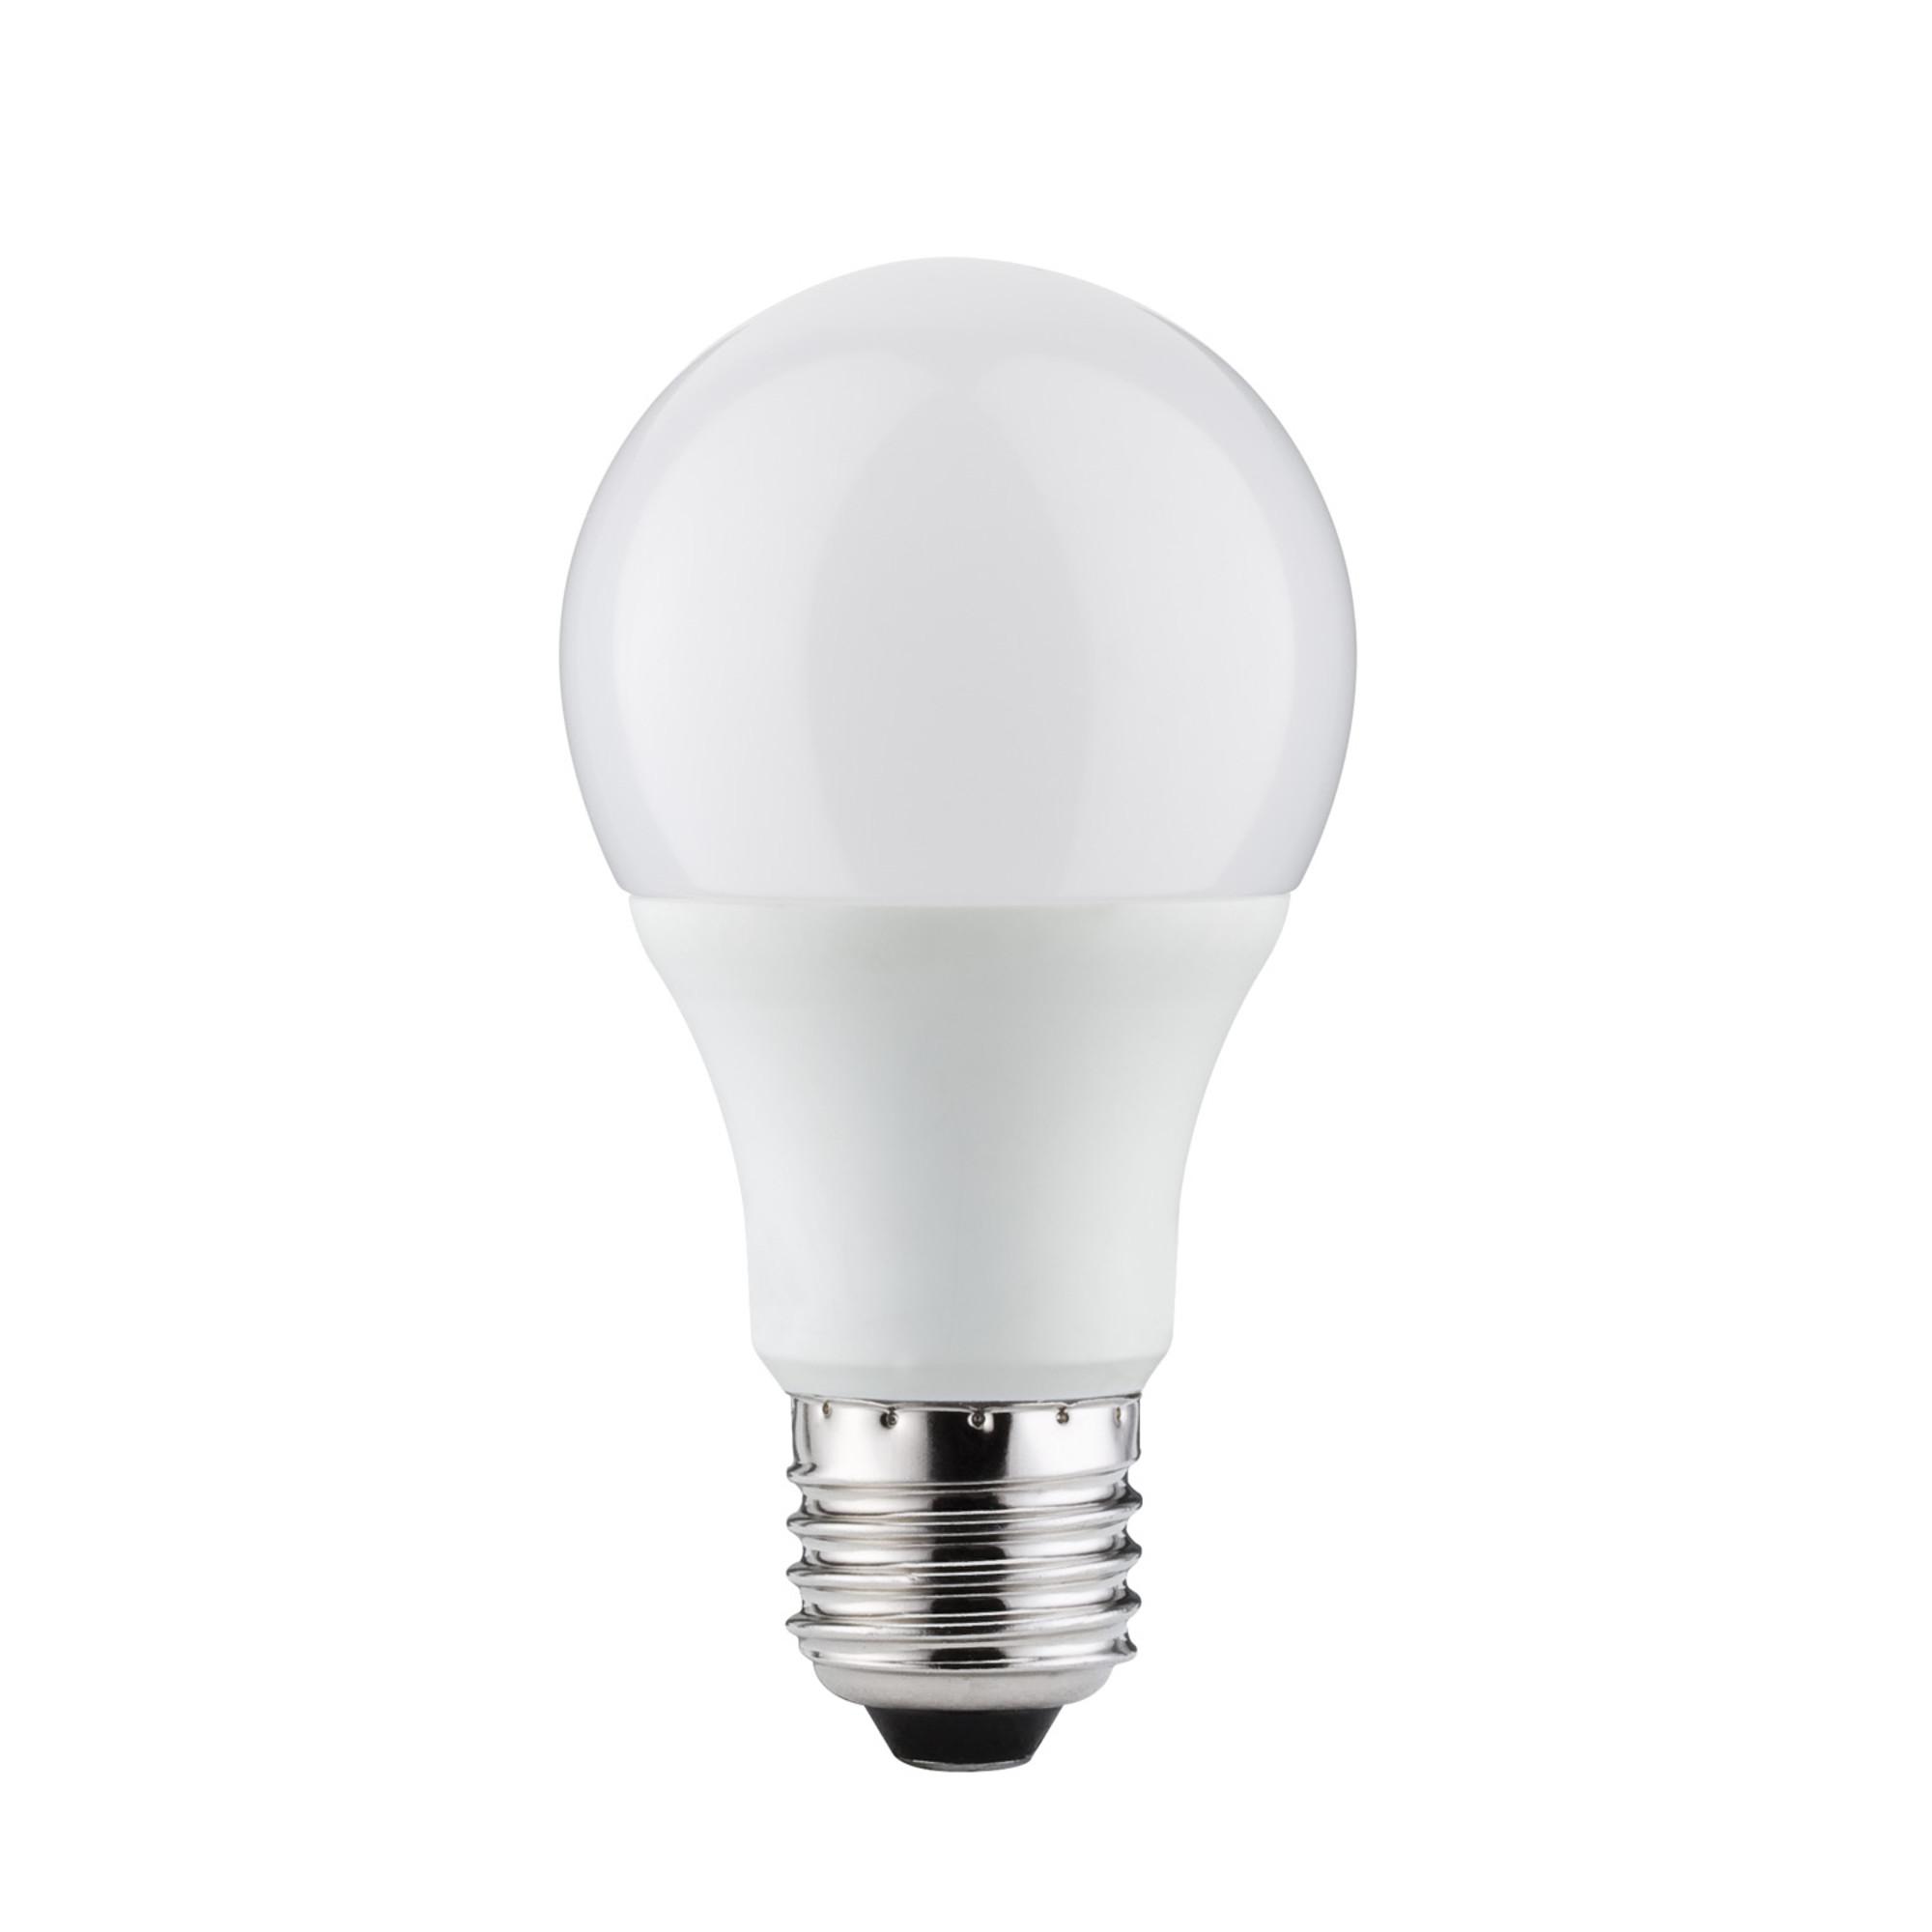 Светодиодная лампочка Paulmann 28350 E27 470 Лм 6 Вт